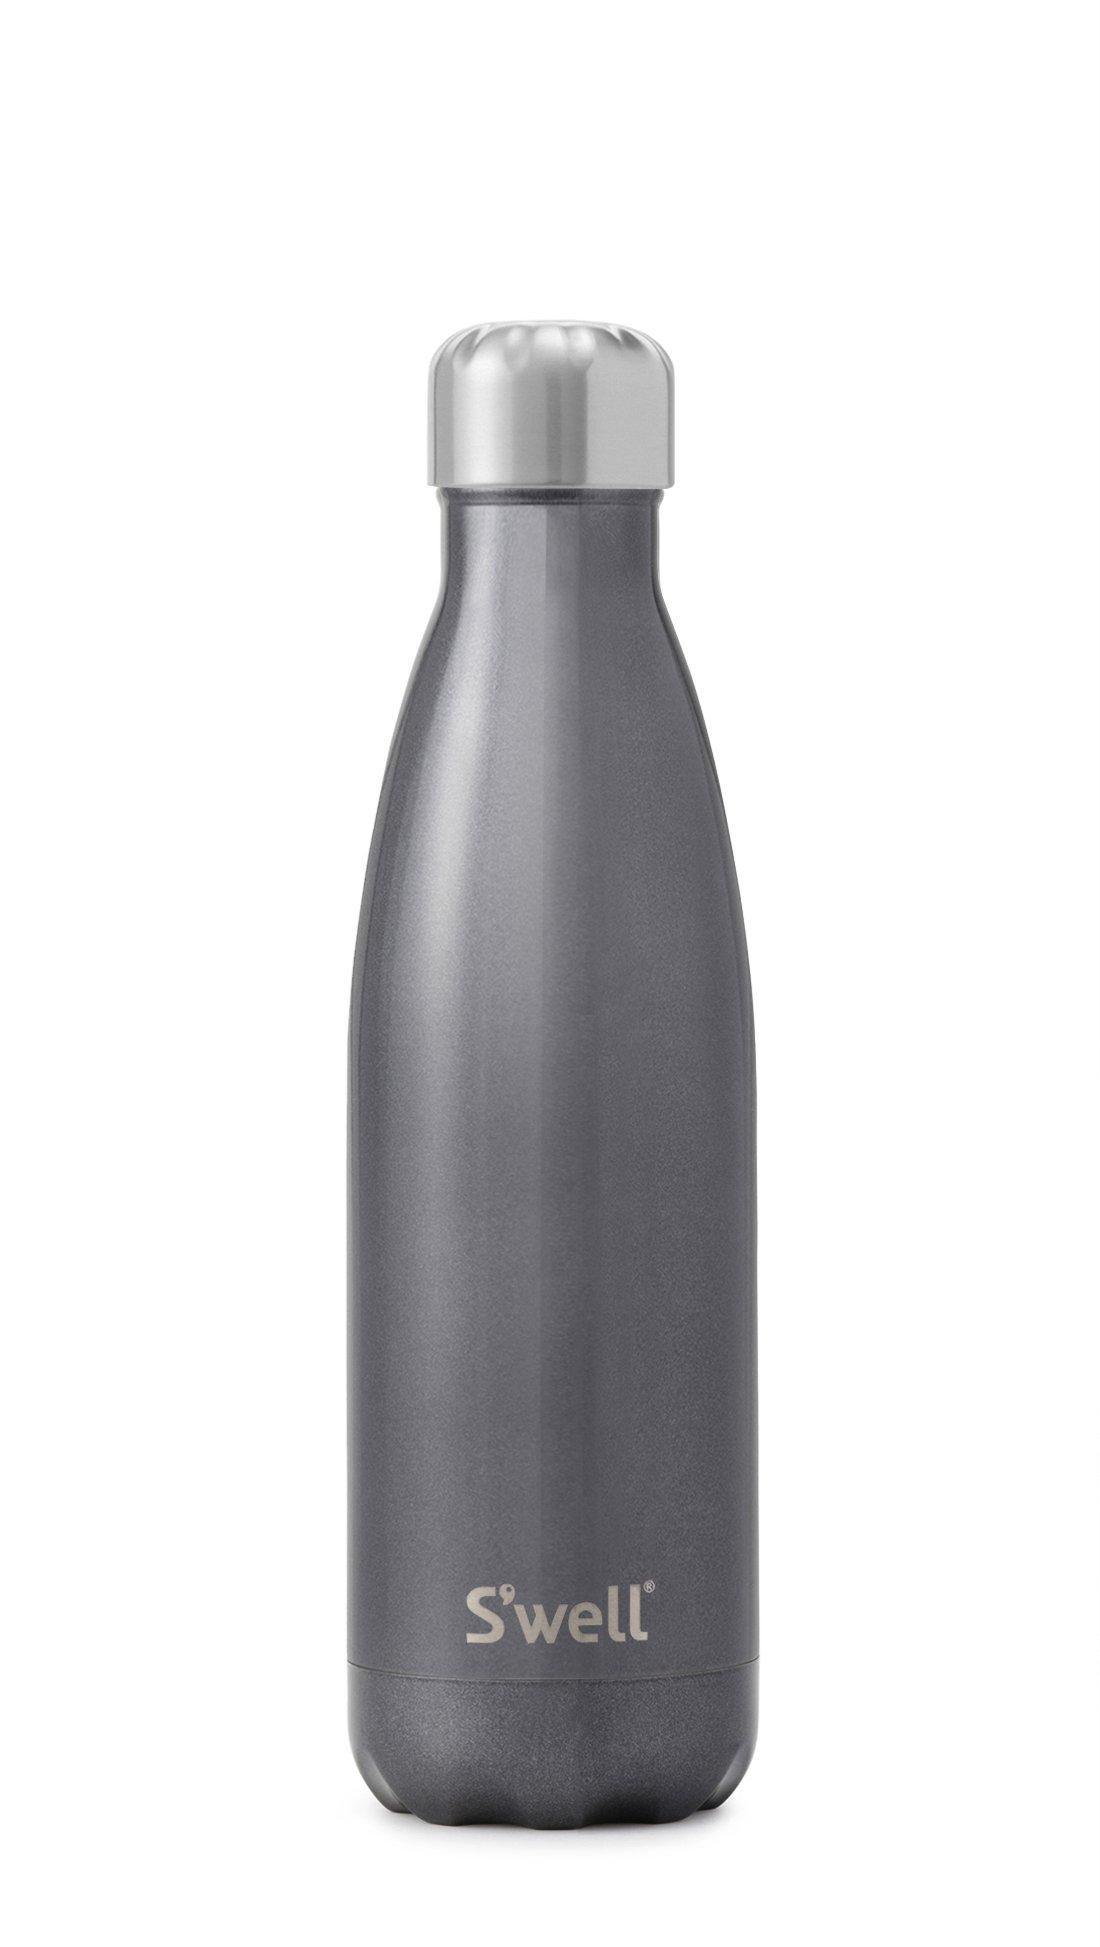 S'well Vacuum Insulated Stainless Steel Water Bottle, 17 oz, Smokey Eye